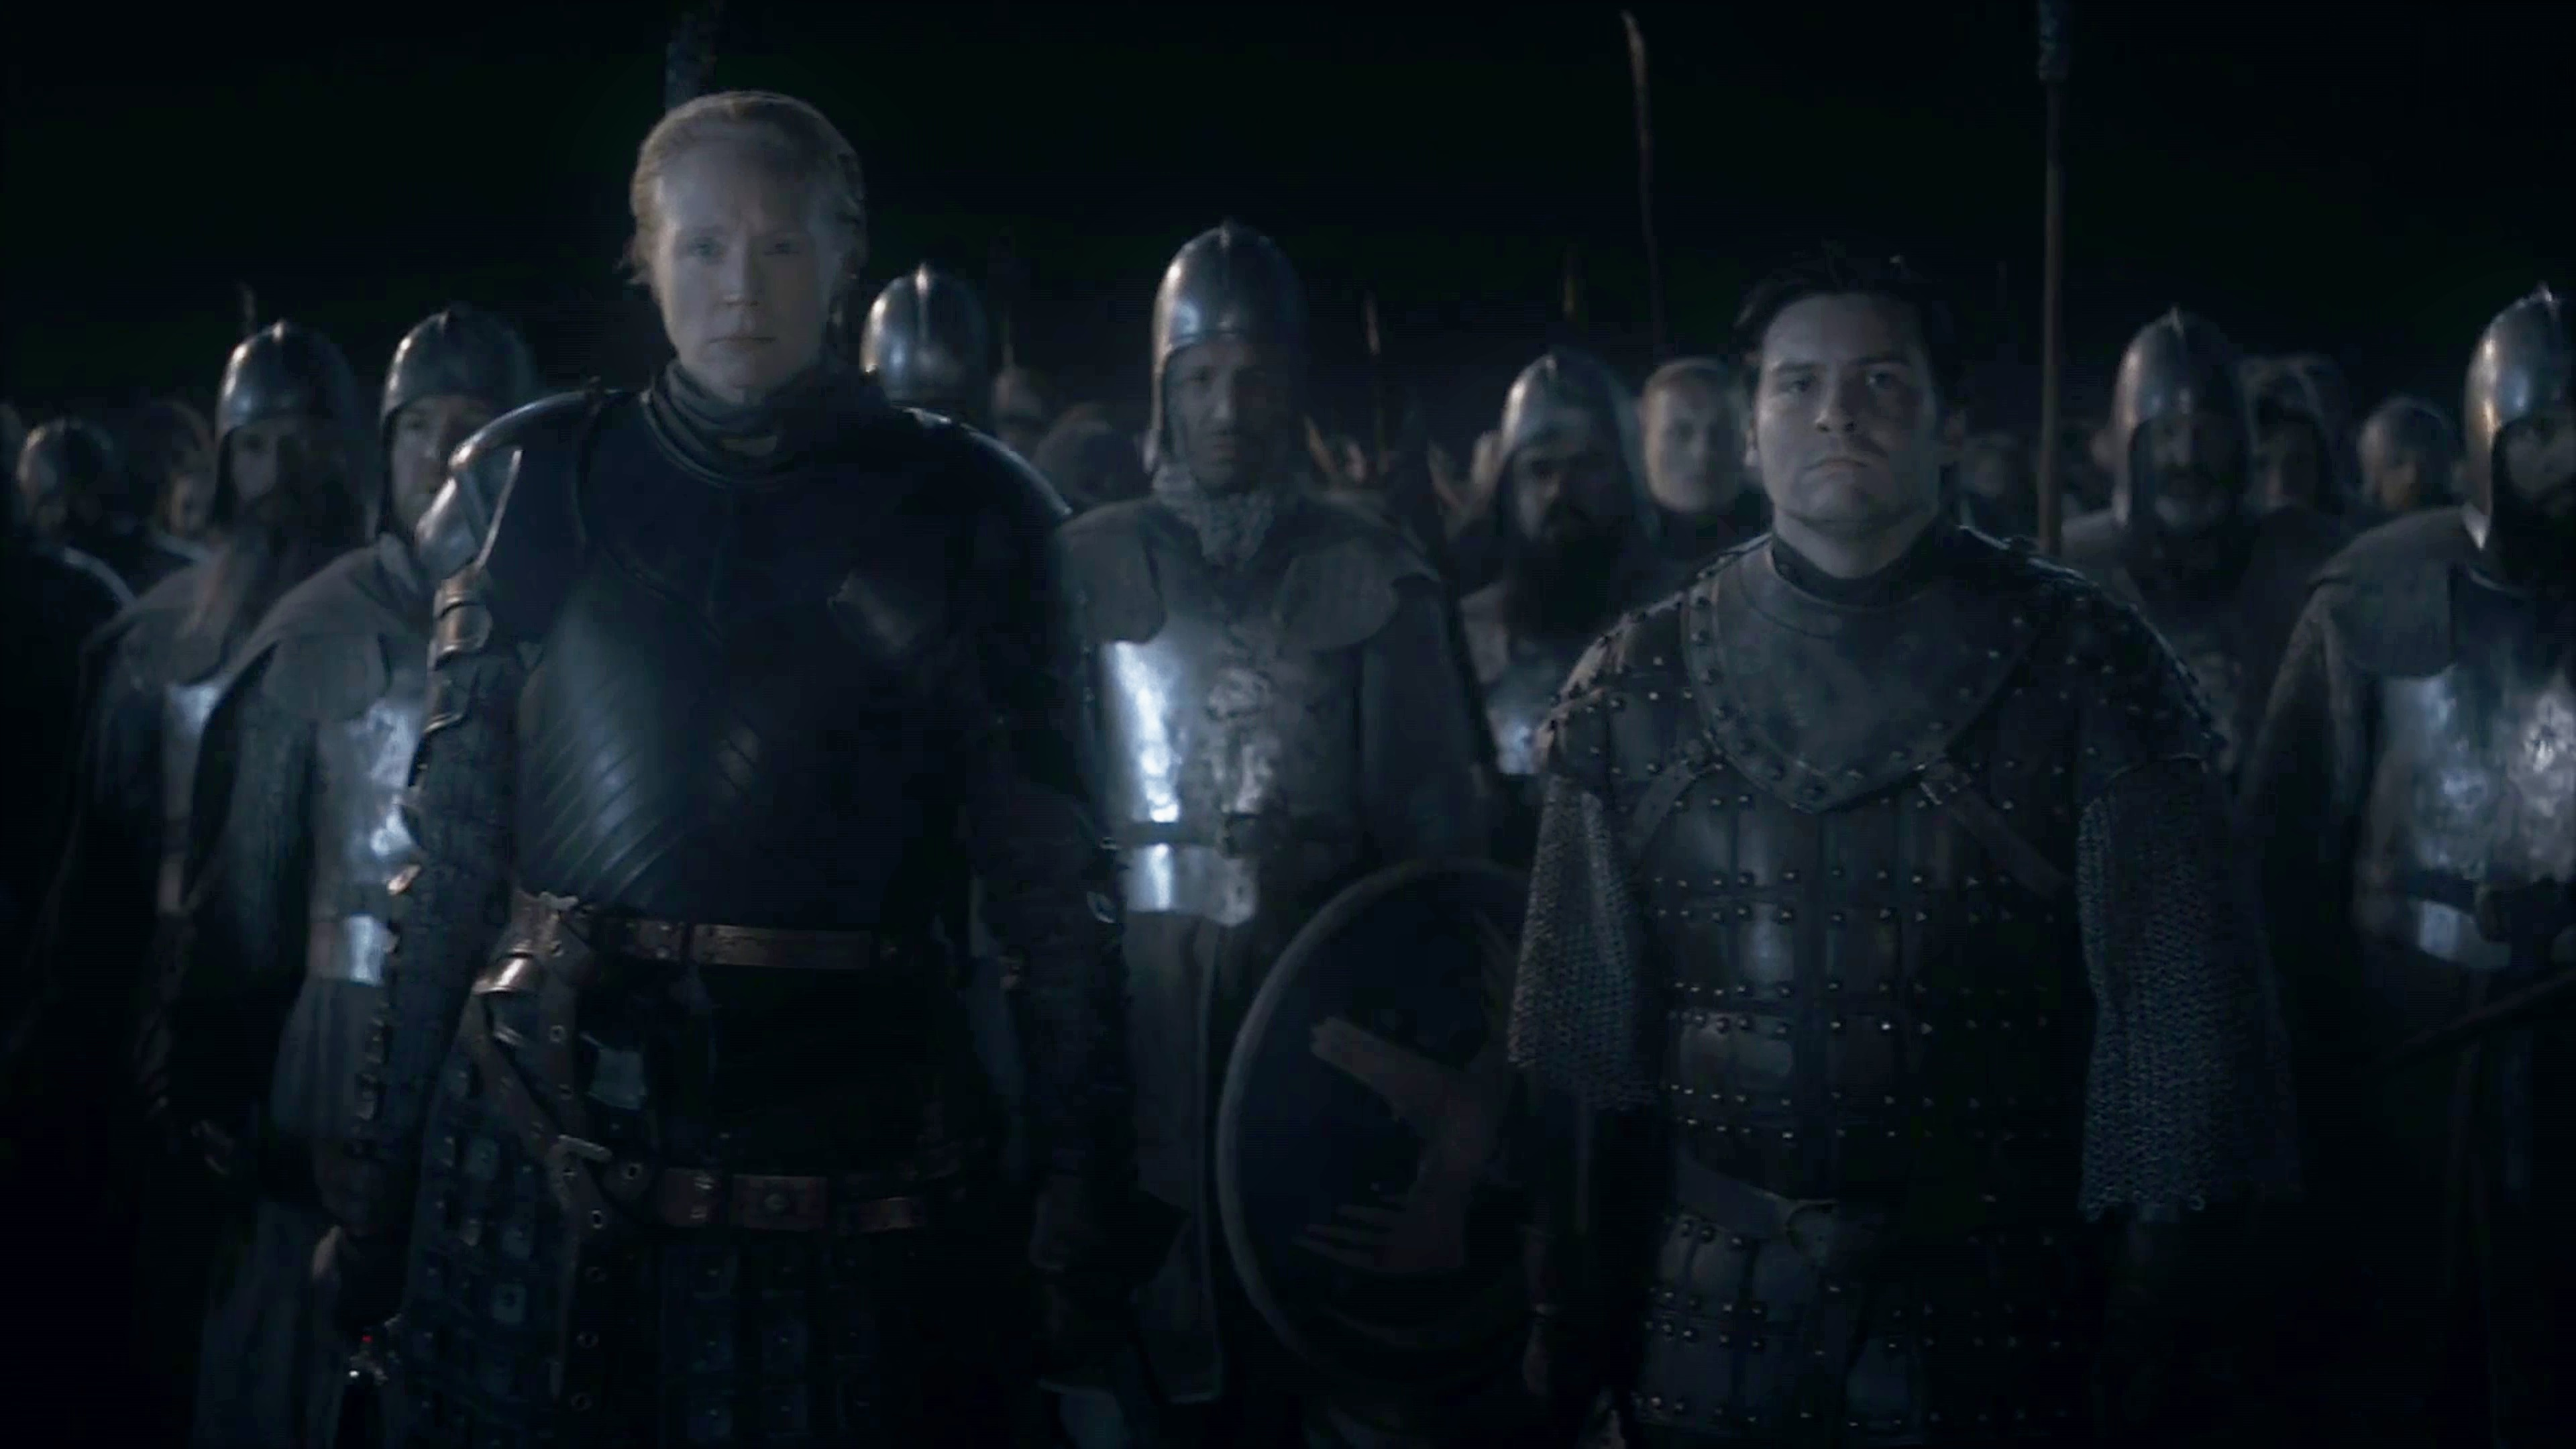 46. Season 8 Trailer Winterfell Battle Brienne of Tarth Podrick Payne Knights Vale